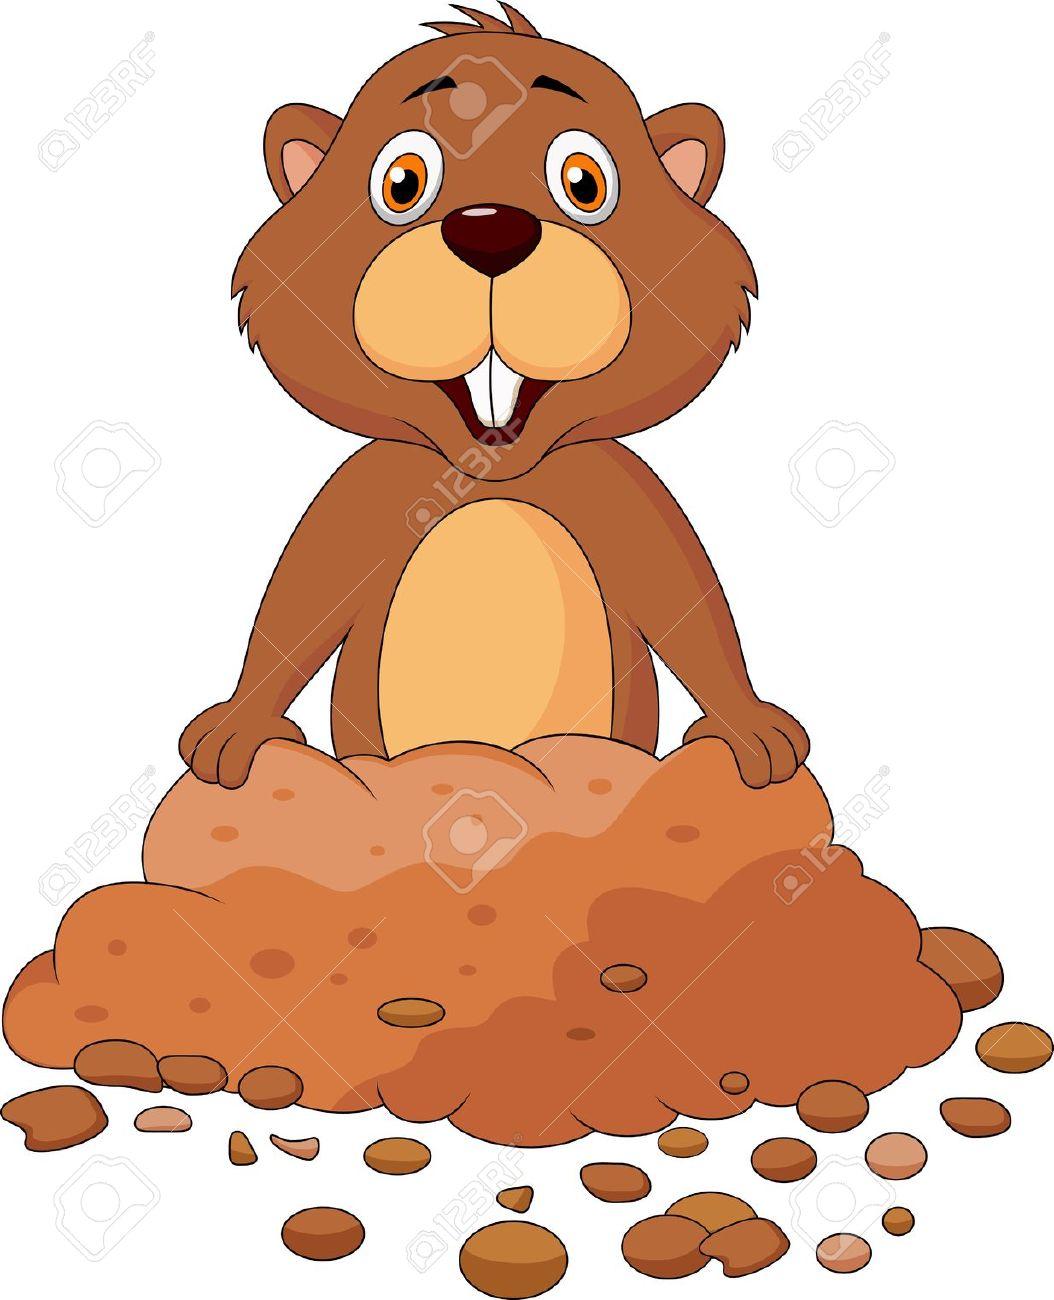 Groundhog Cartoon Clip Art-groundhog cartoon clip art-10